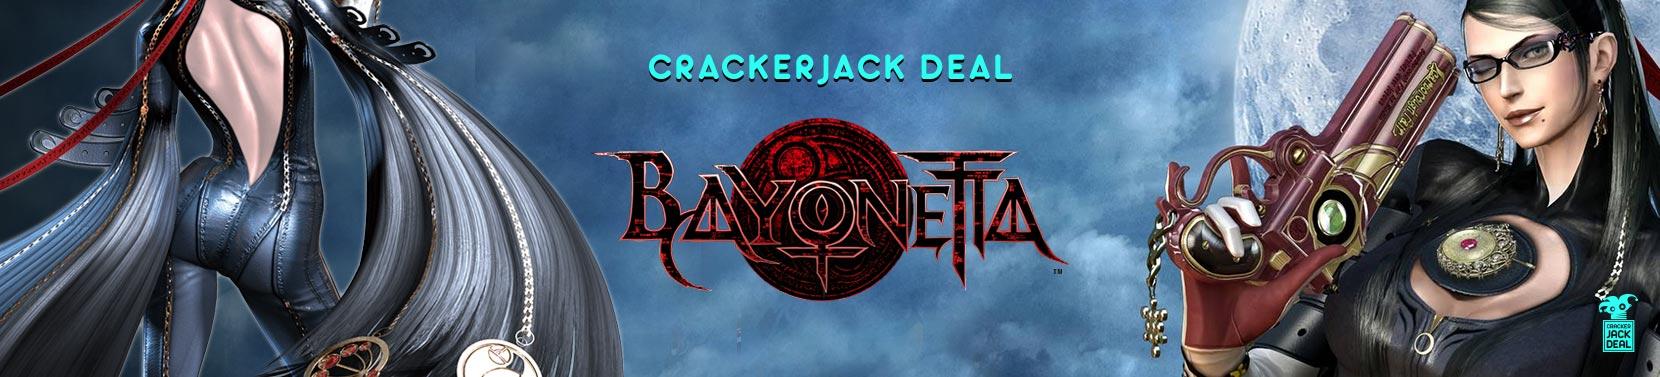 bayonetta-cracker-banner-page[1].jpg